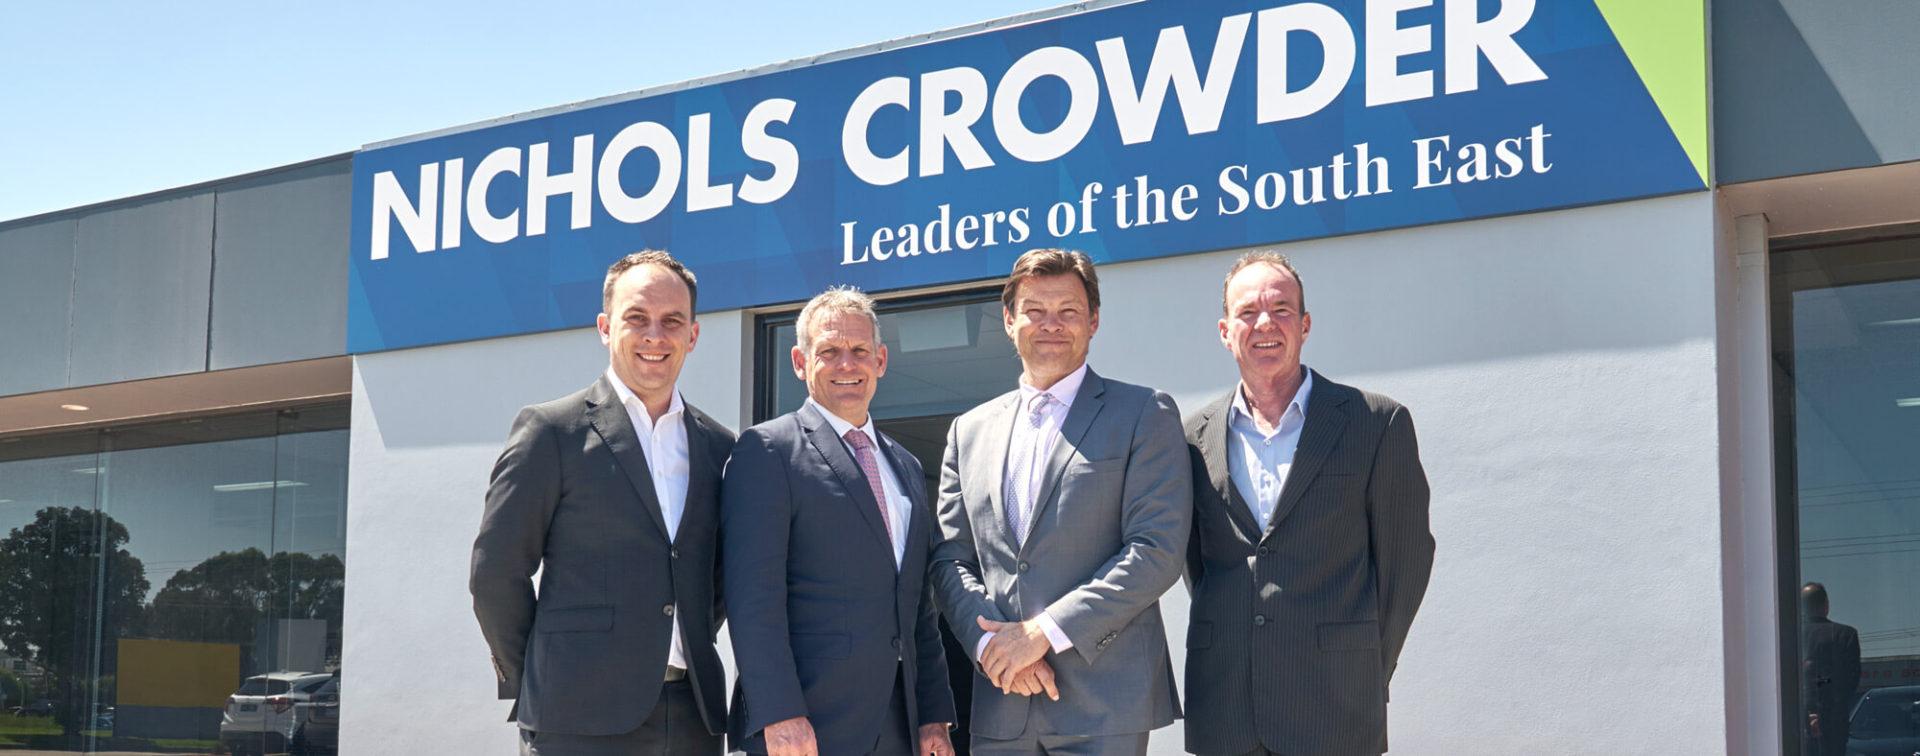 Nichols Crowder's Directors